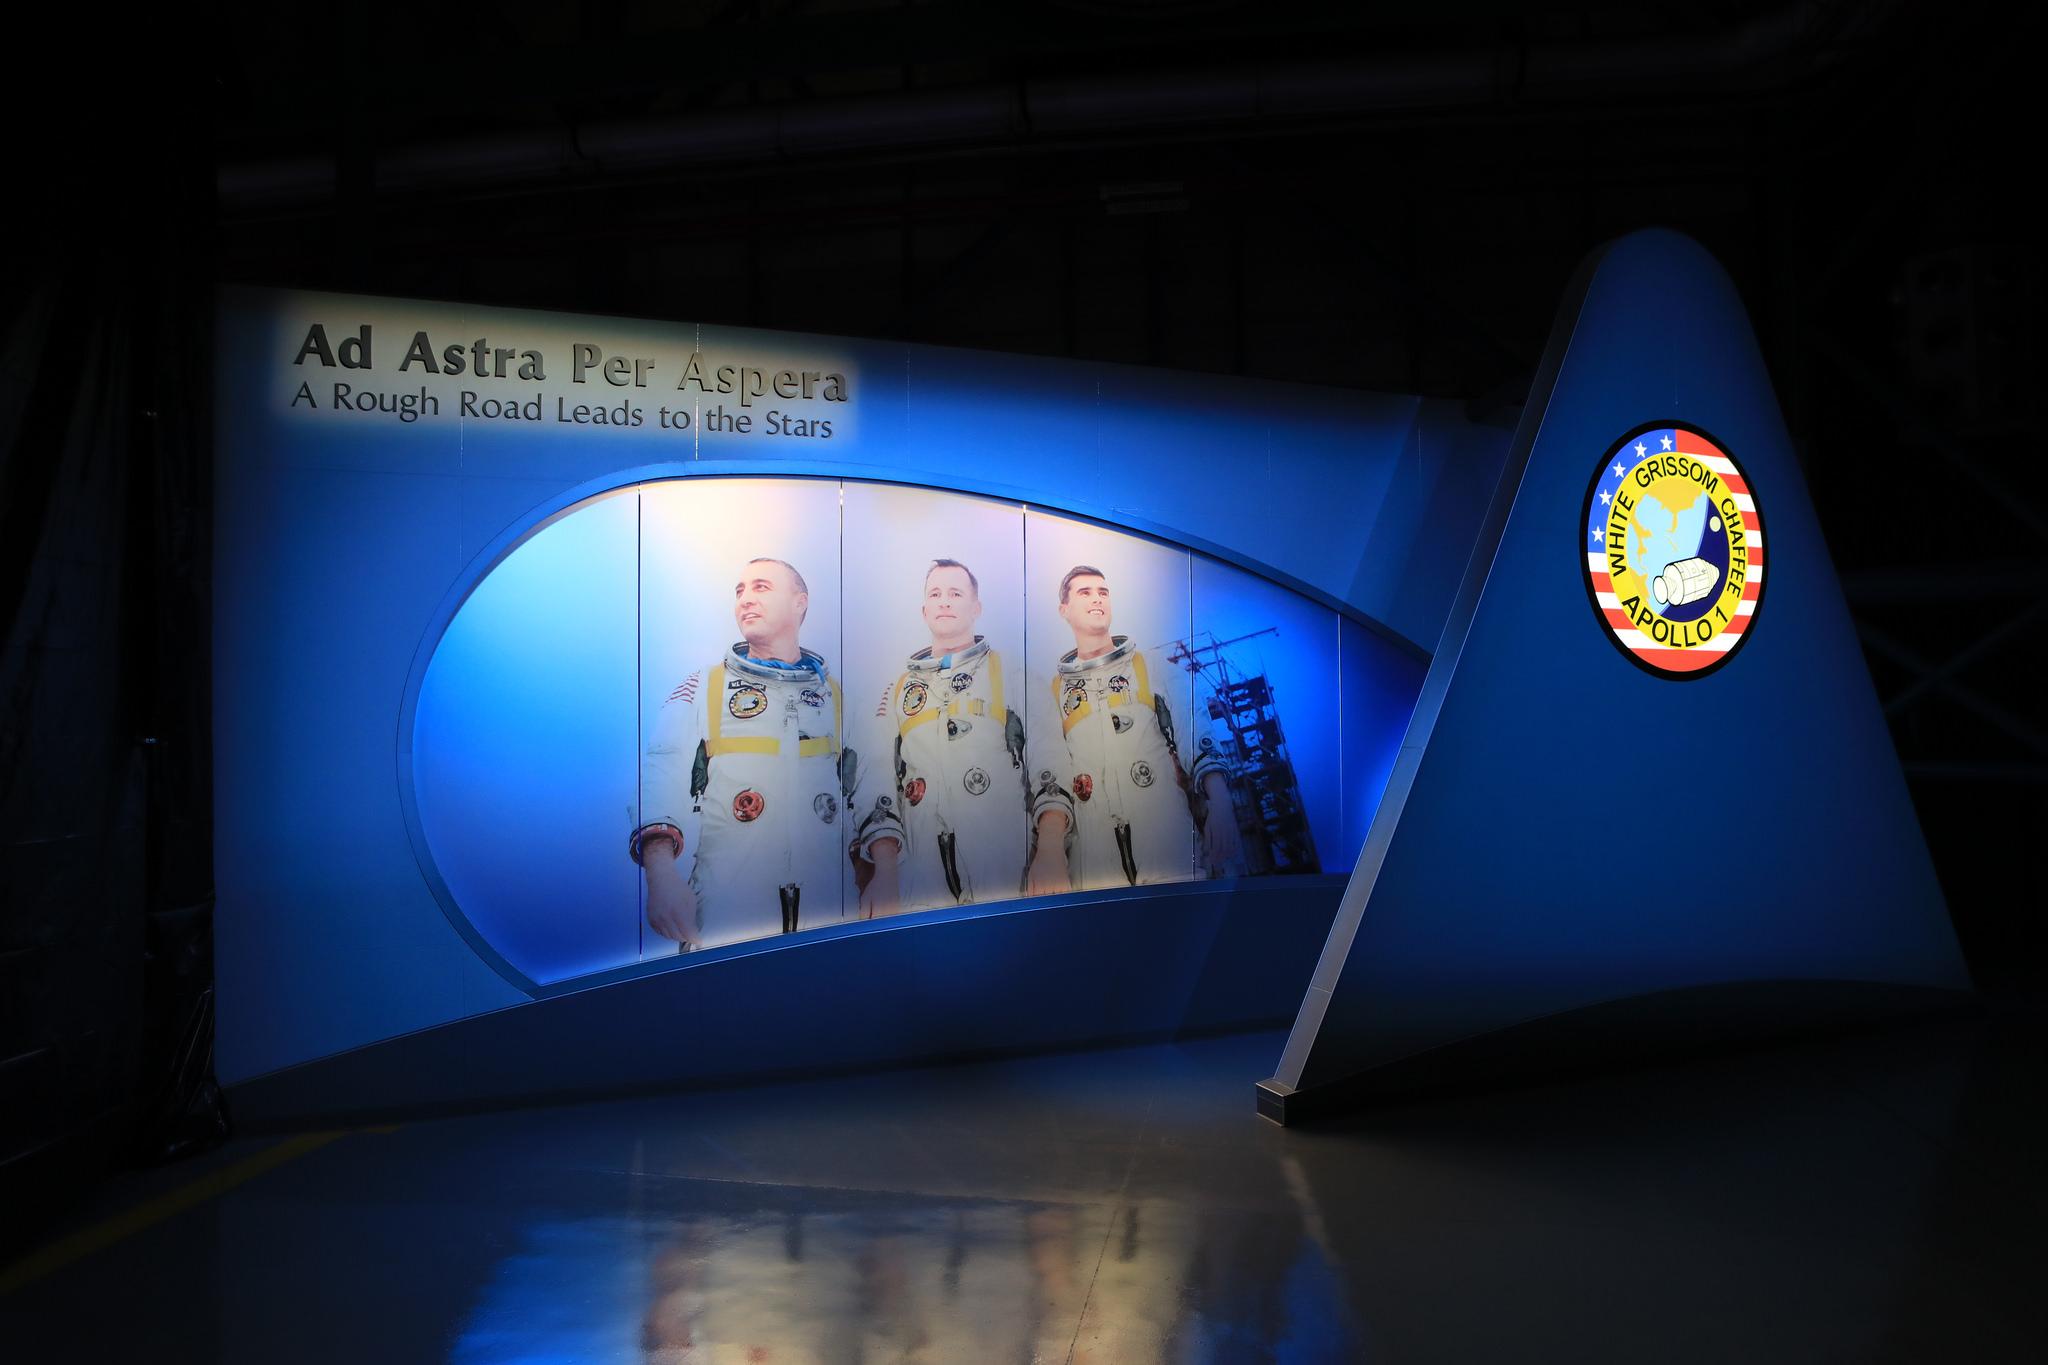 Remembering the Apollo 1 Crew: 'Ad Astra Per Aspera' Exhibit in Pictures